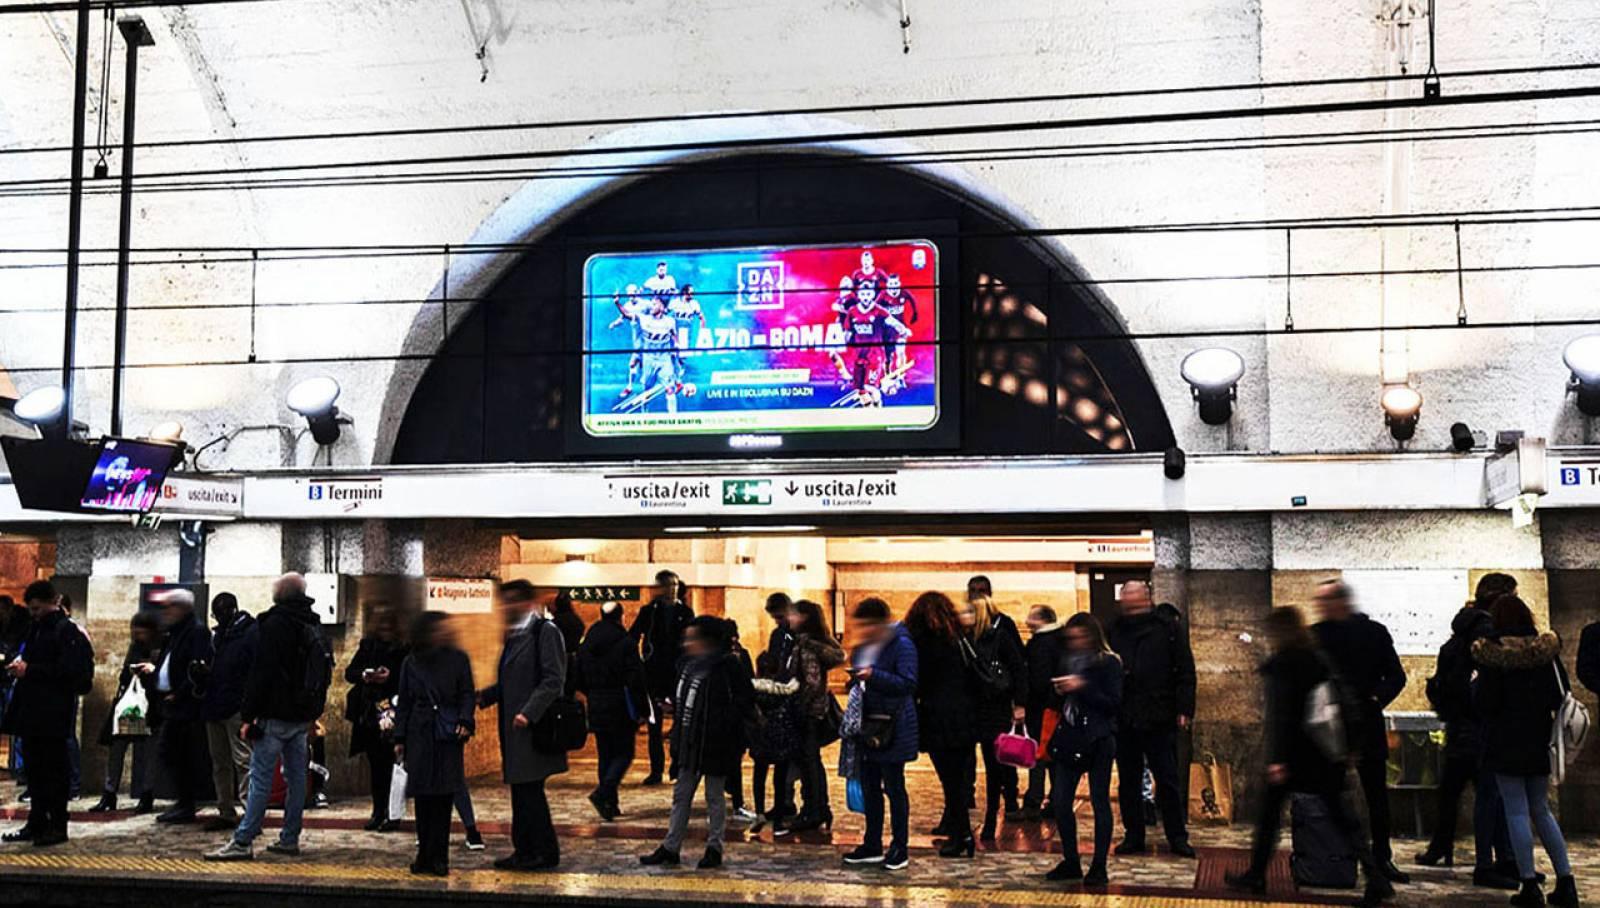 Pubblicità in metropolitana a Roma IGPDecaux Horizon